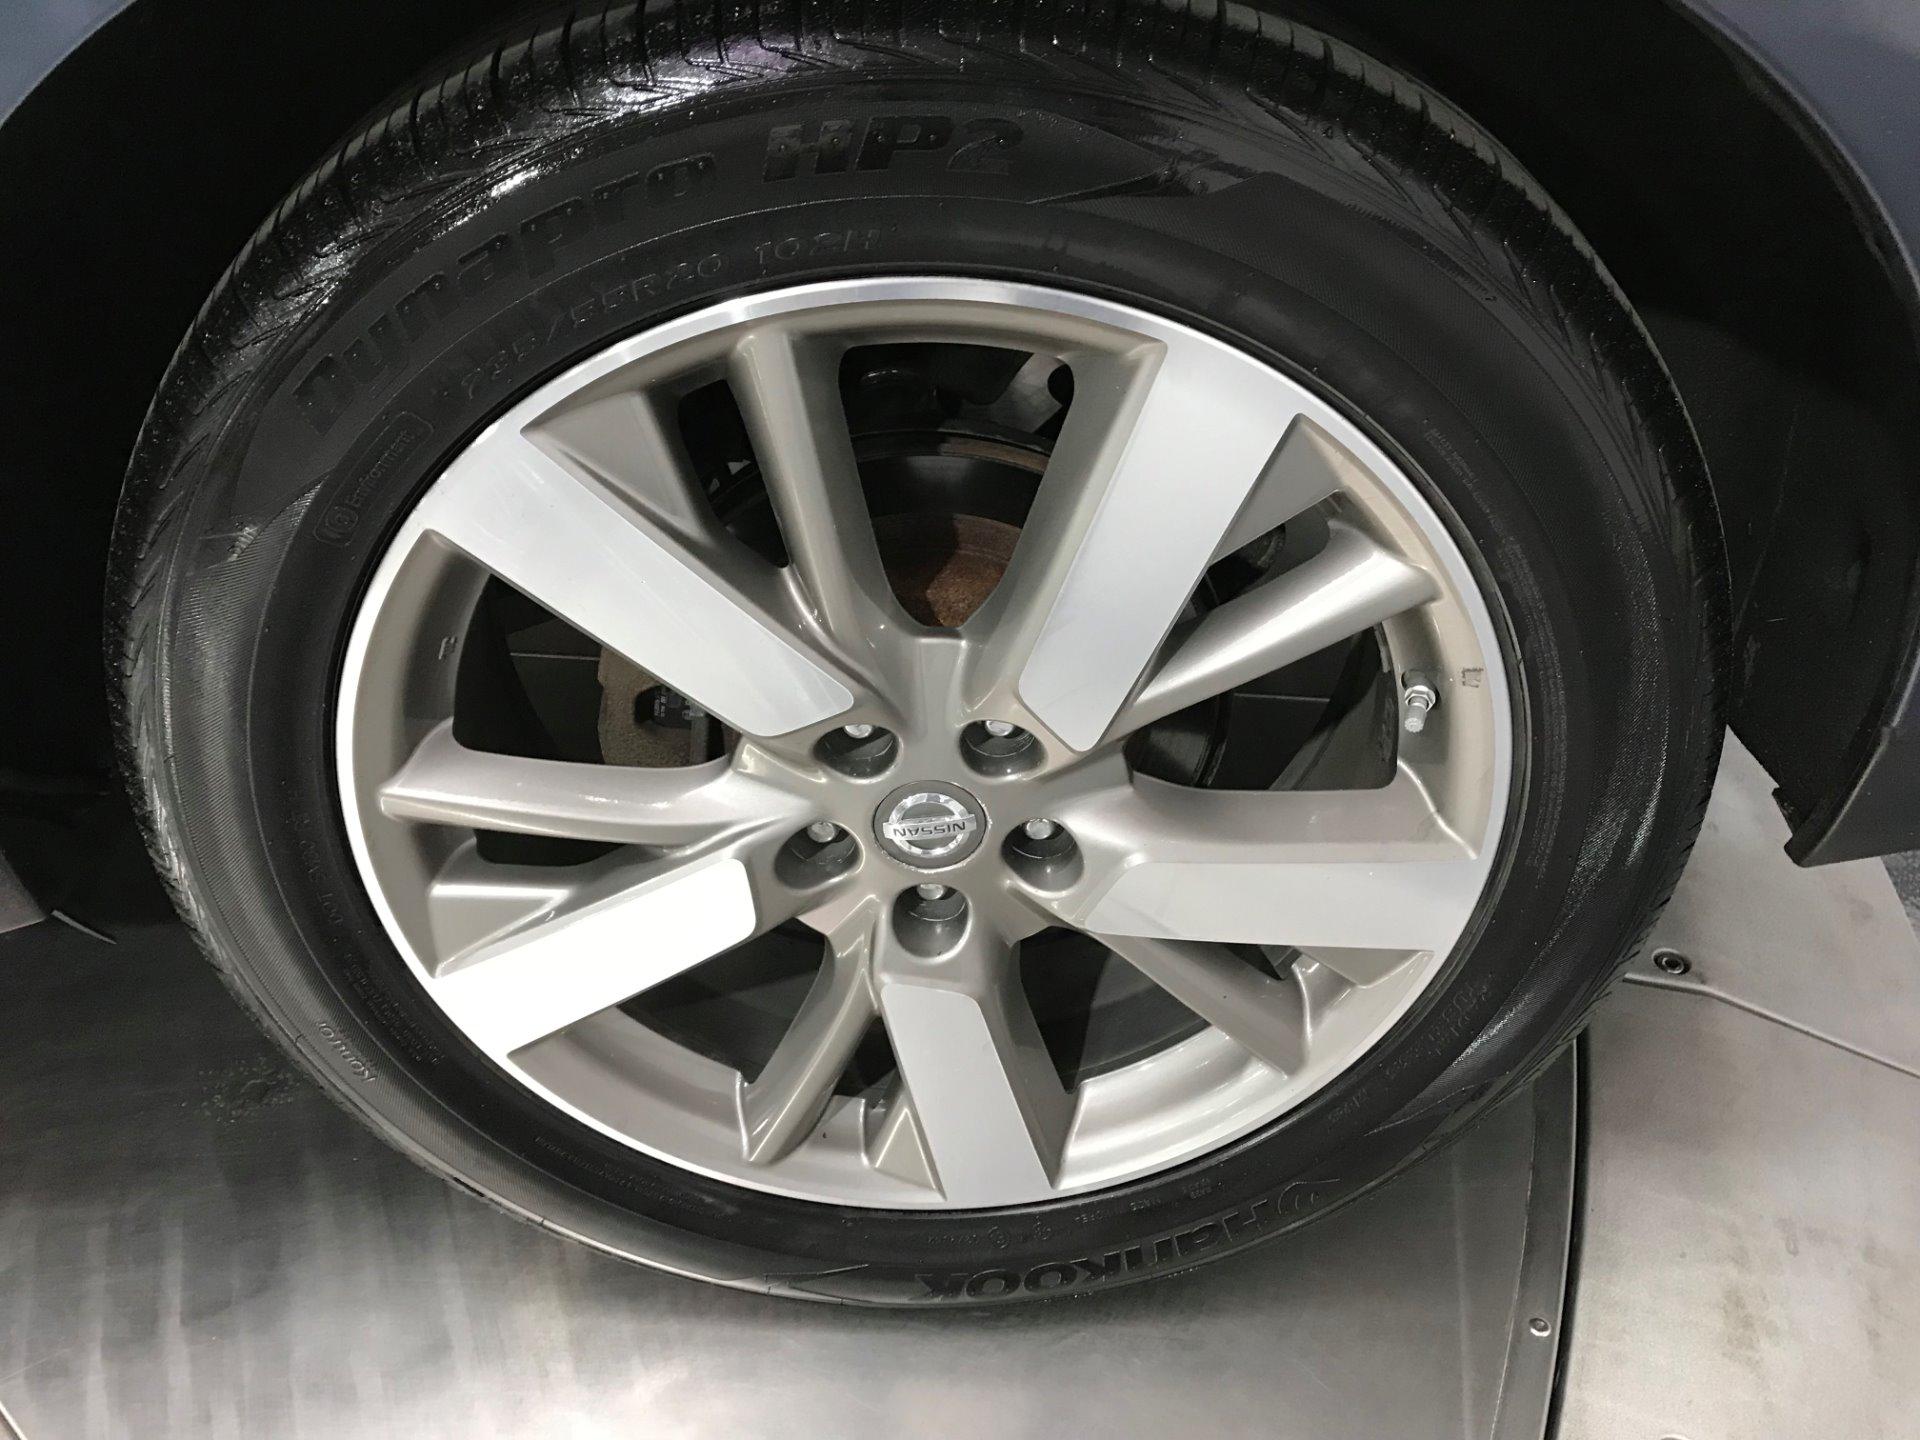 2014 Nissan Pathfinder Platinum Stock 24455 For Sale Near Alsip Trailer Harness Used